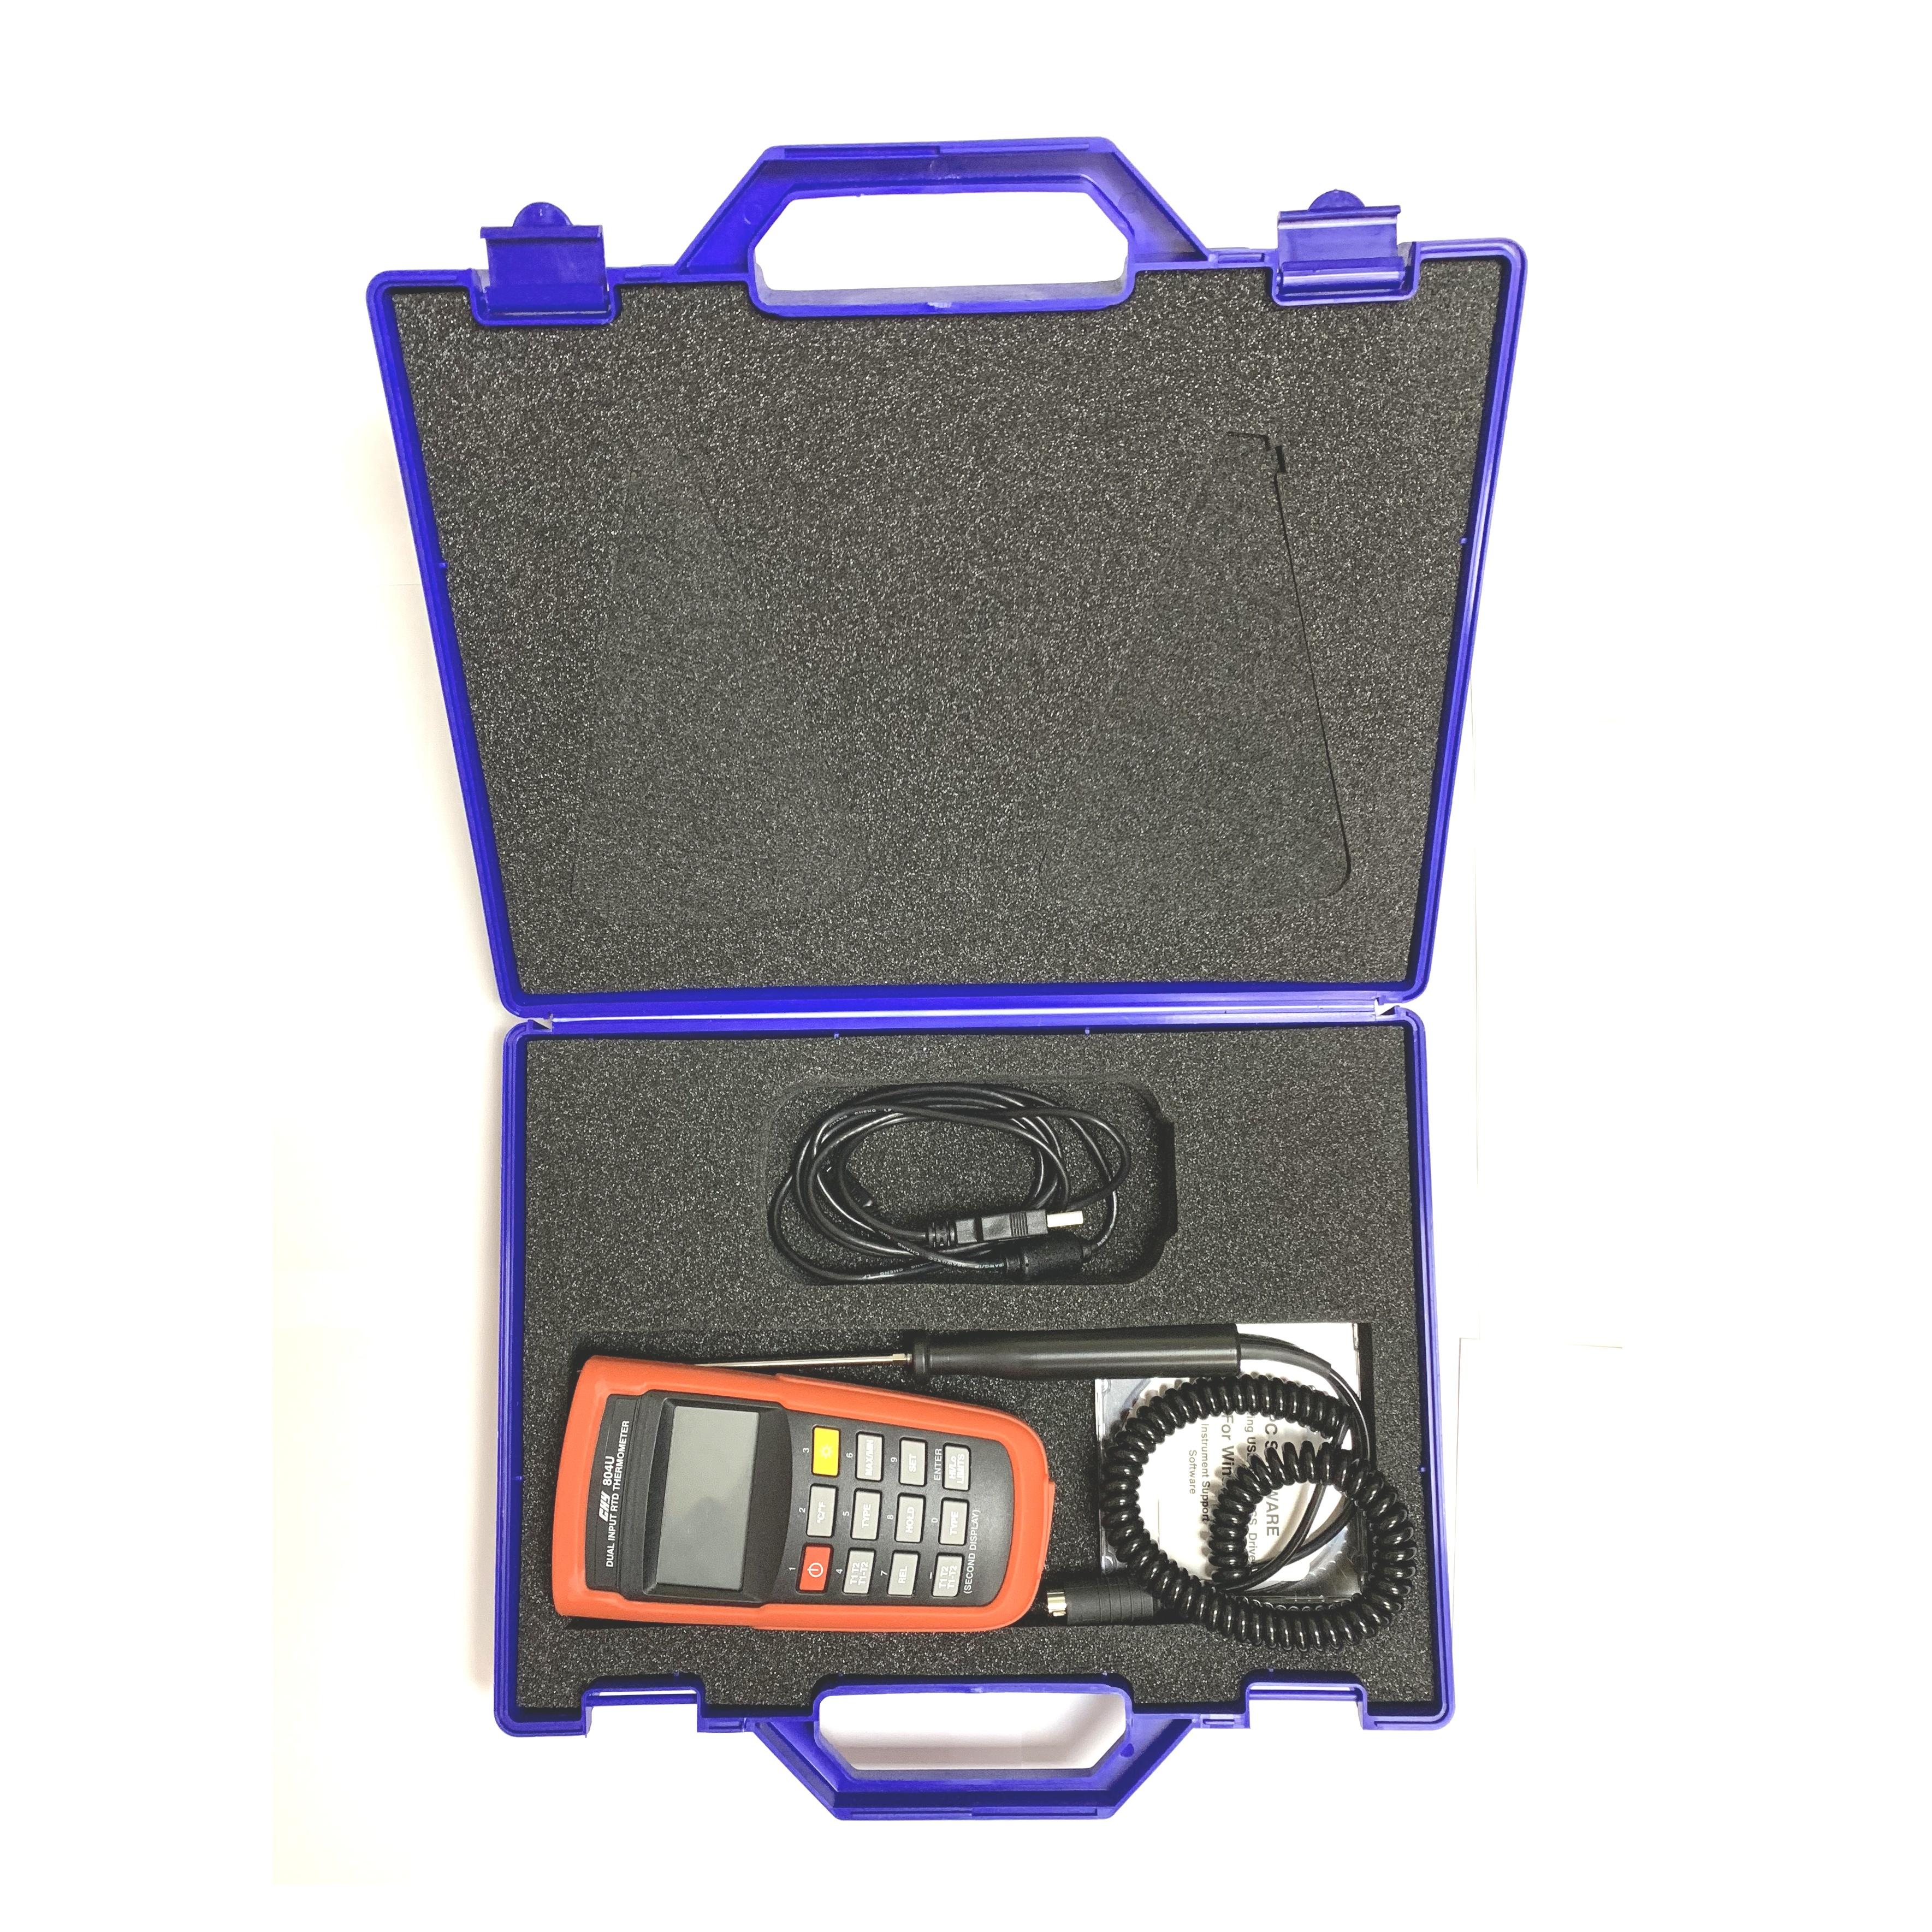 Kit termometro RTD